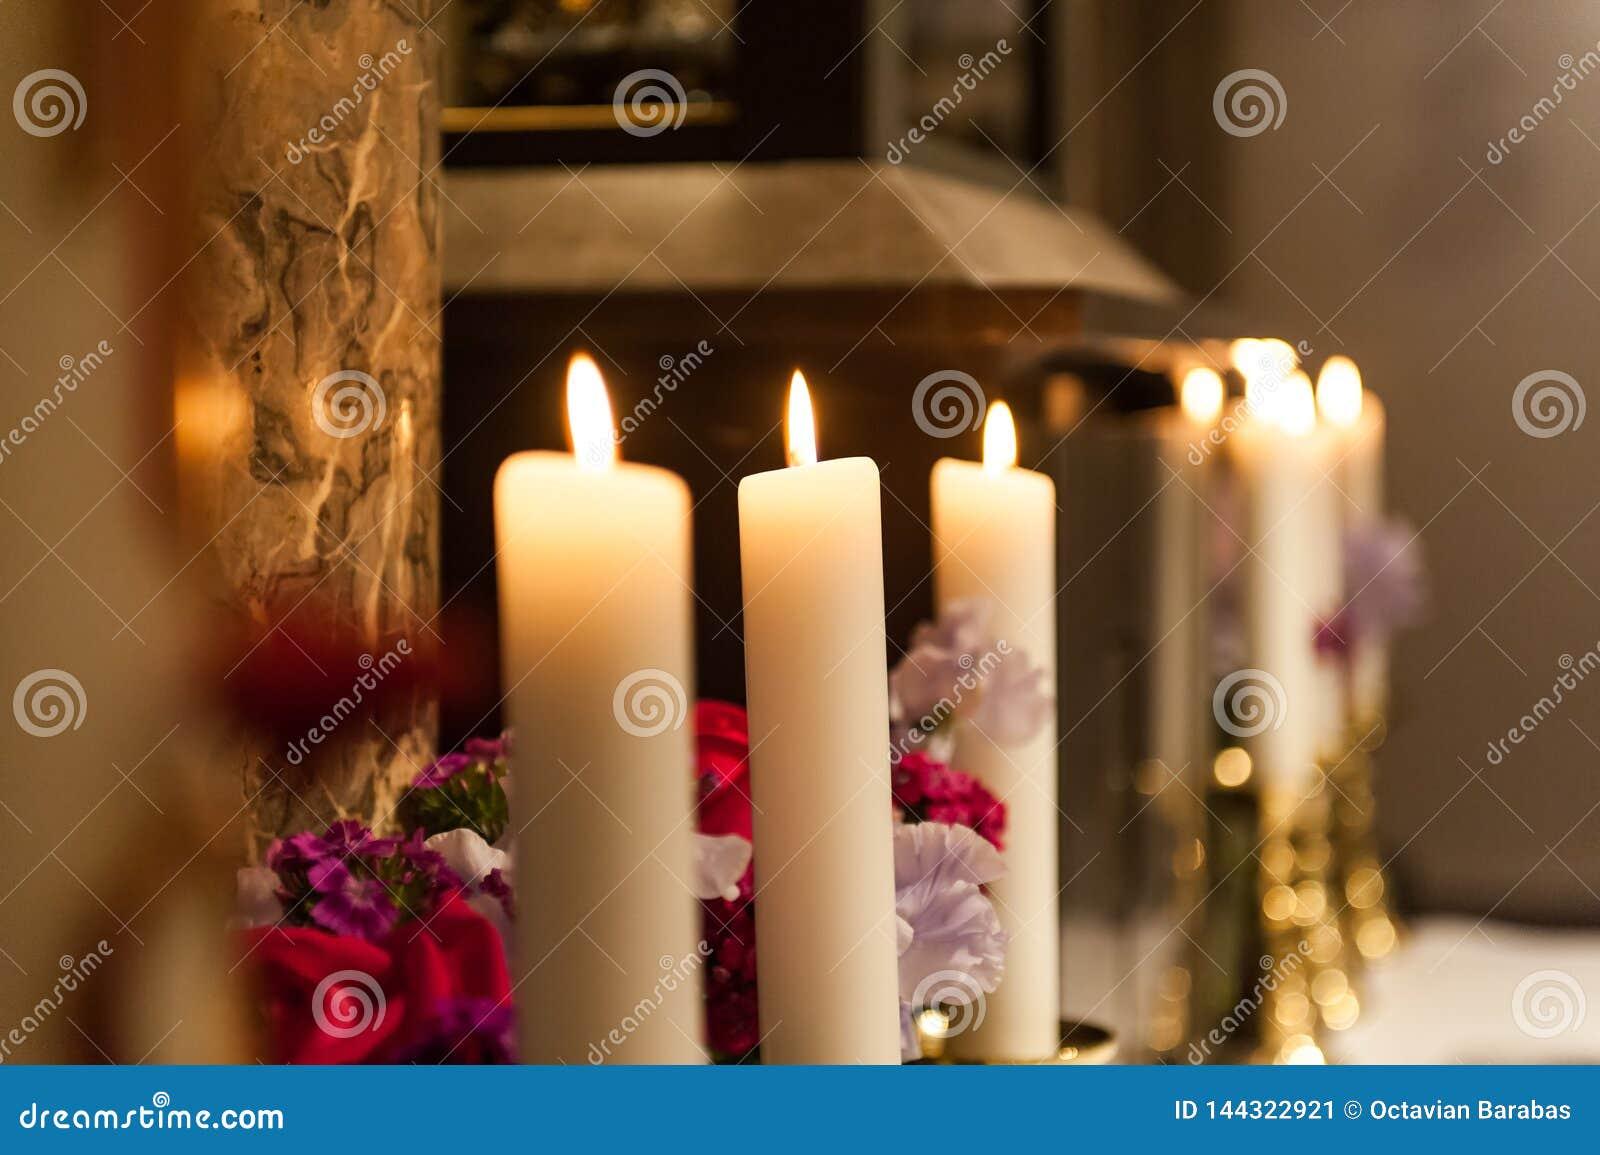 Grote kaarsen die in de kerk met vage achtergrond branden